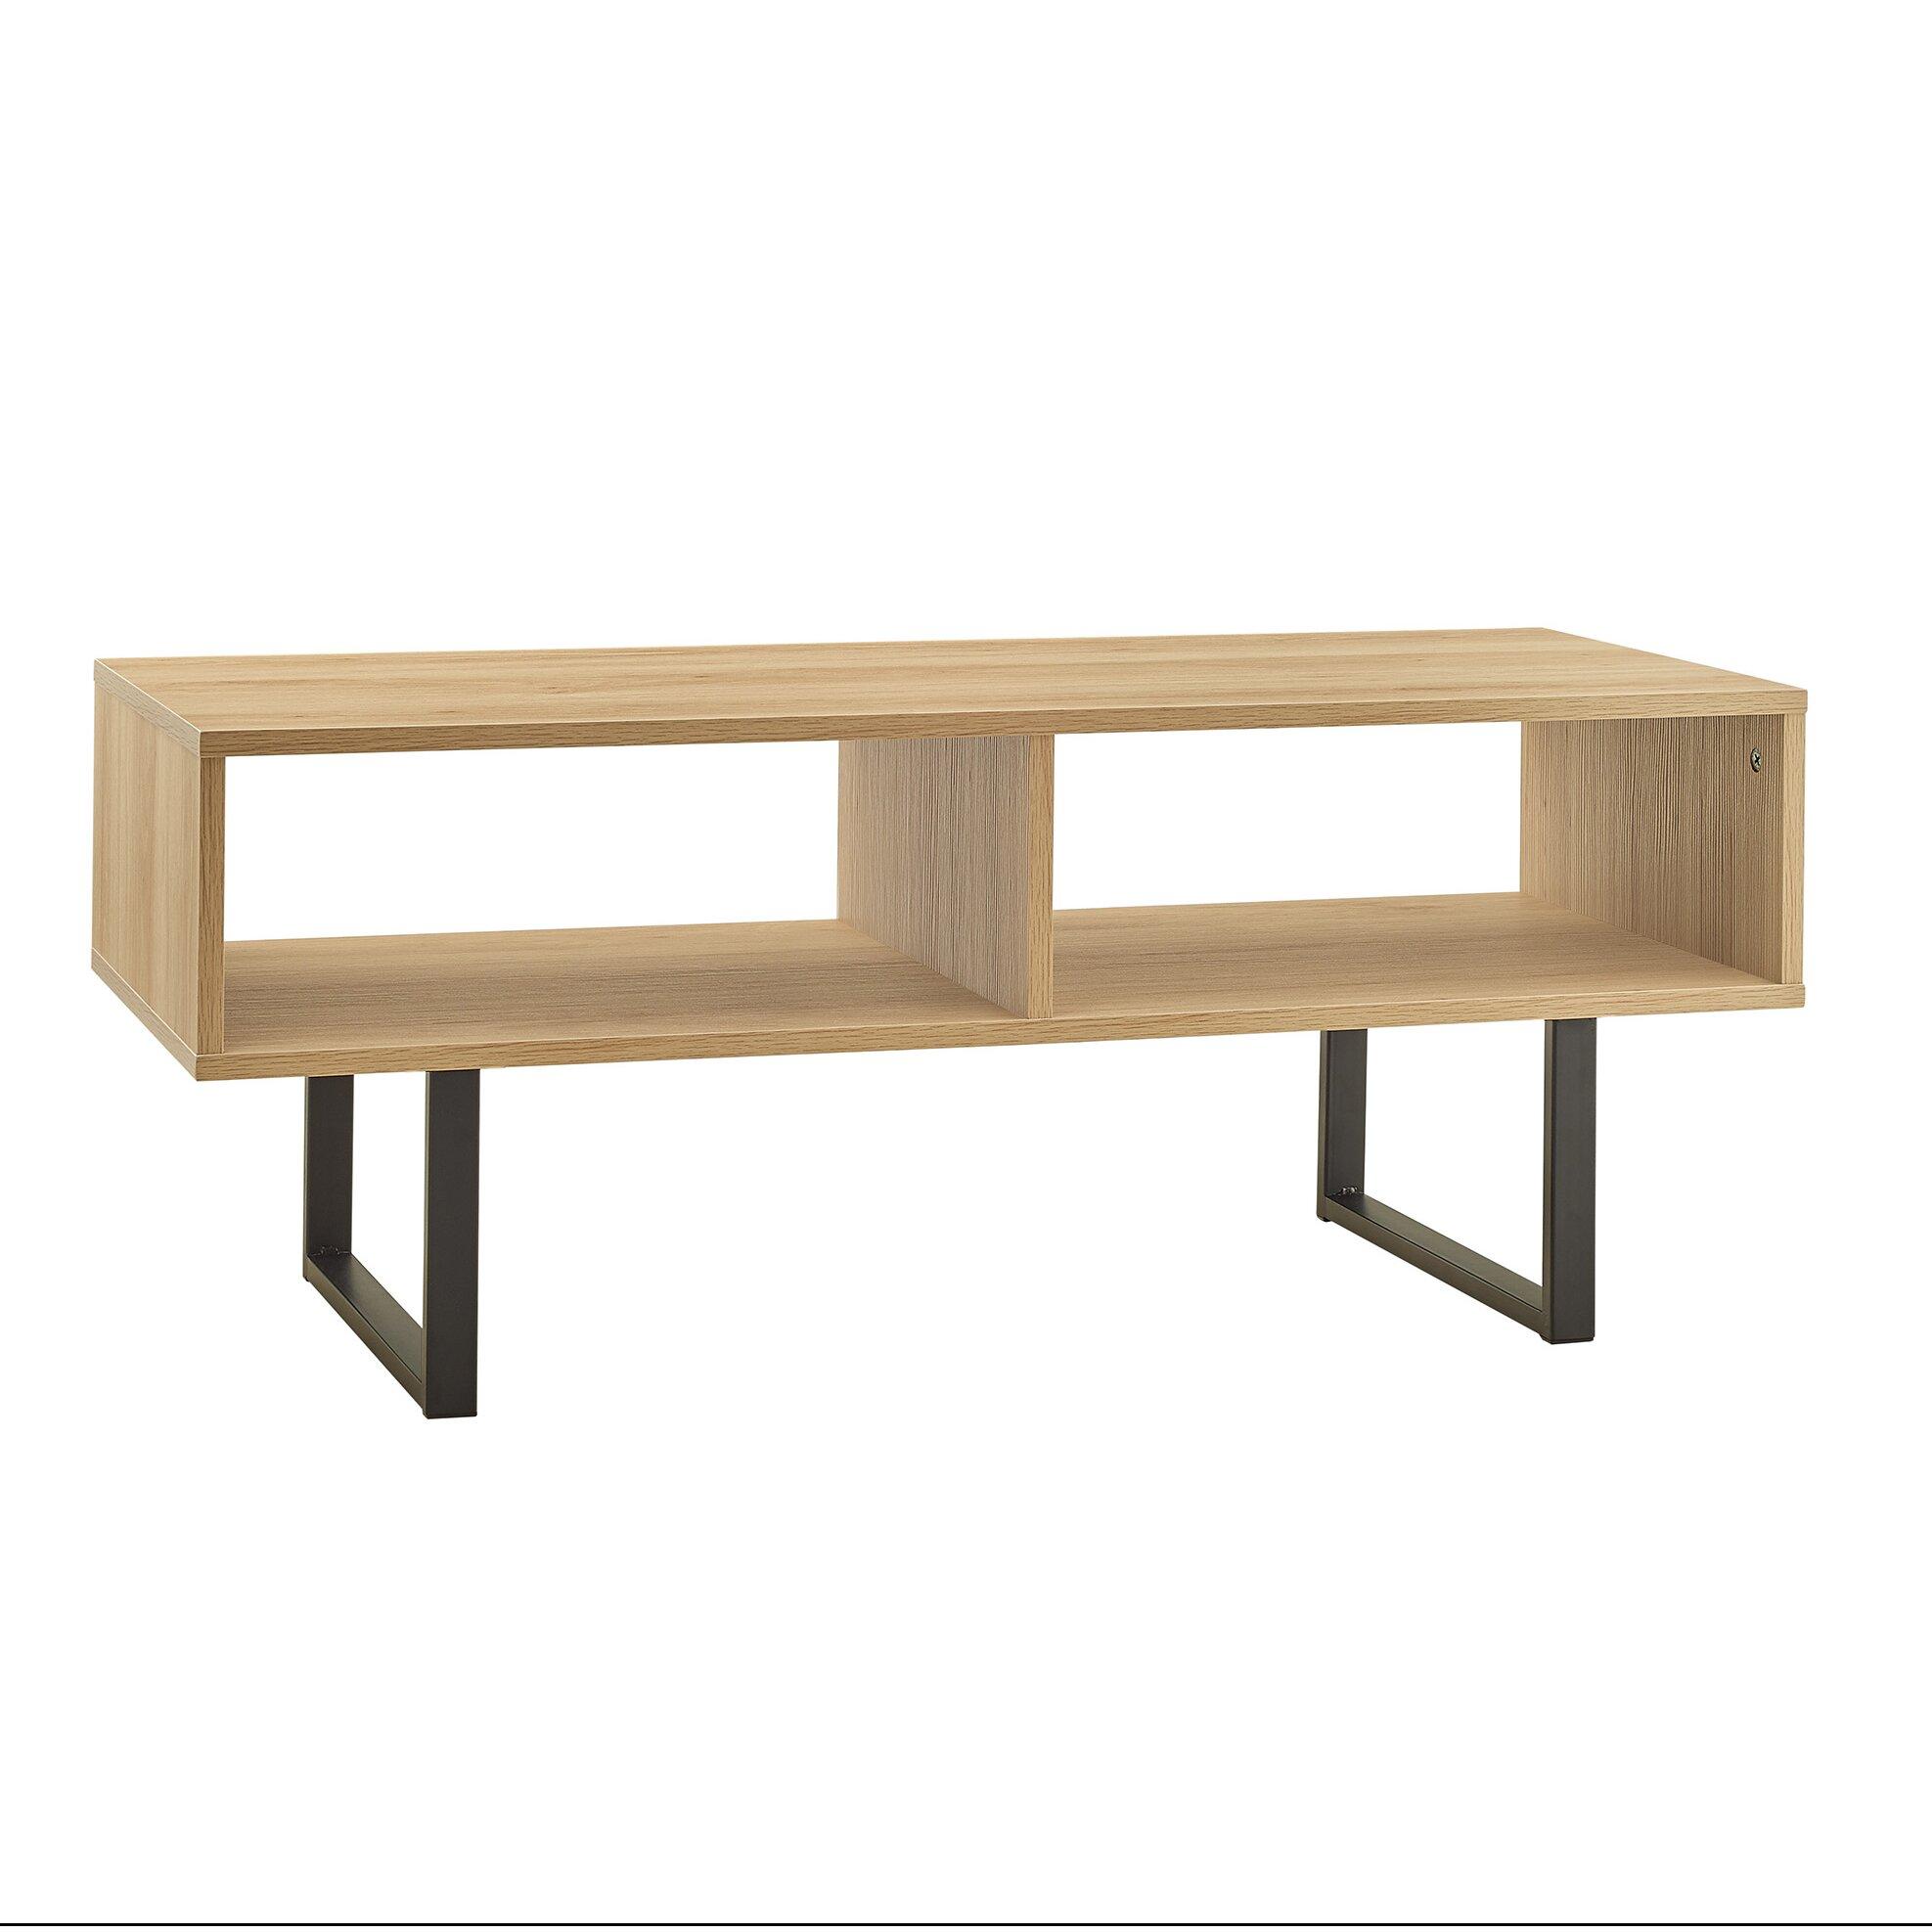 Closetmaid coffee table reviews wayfair for Wayfair coffee tables with storage